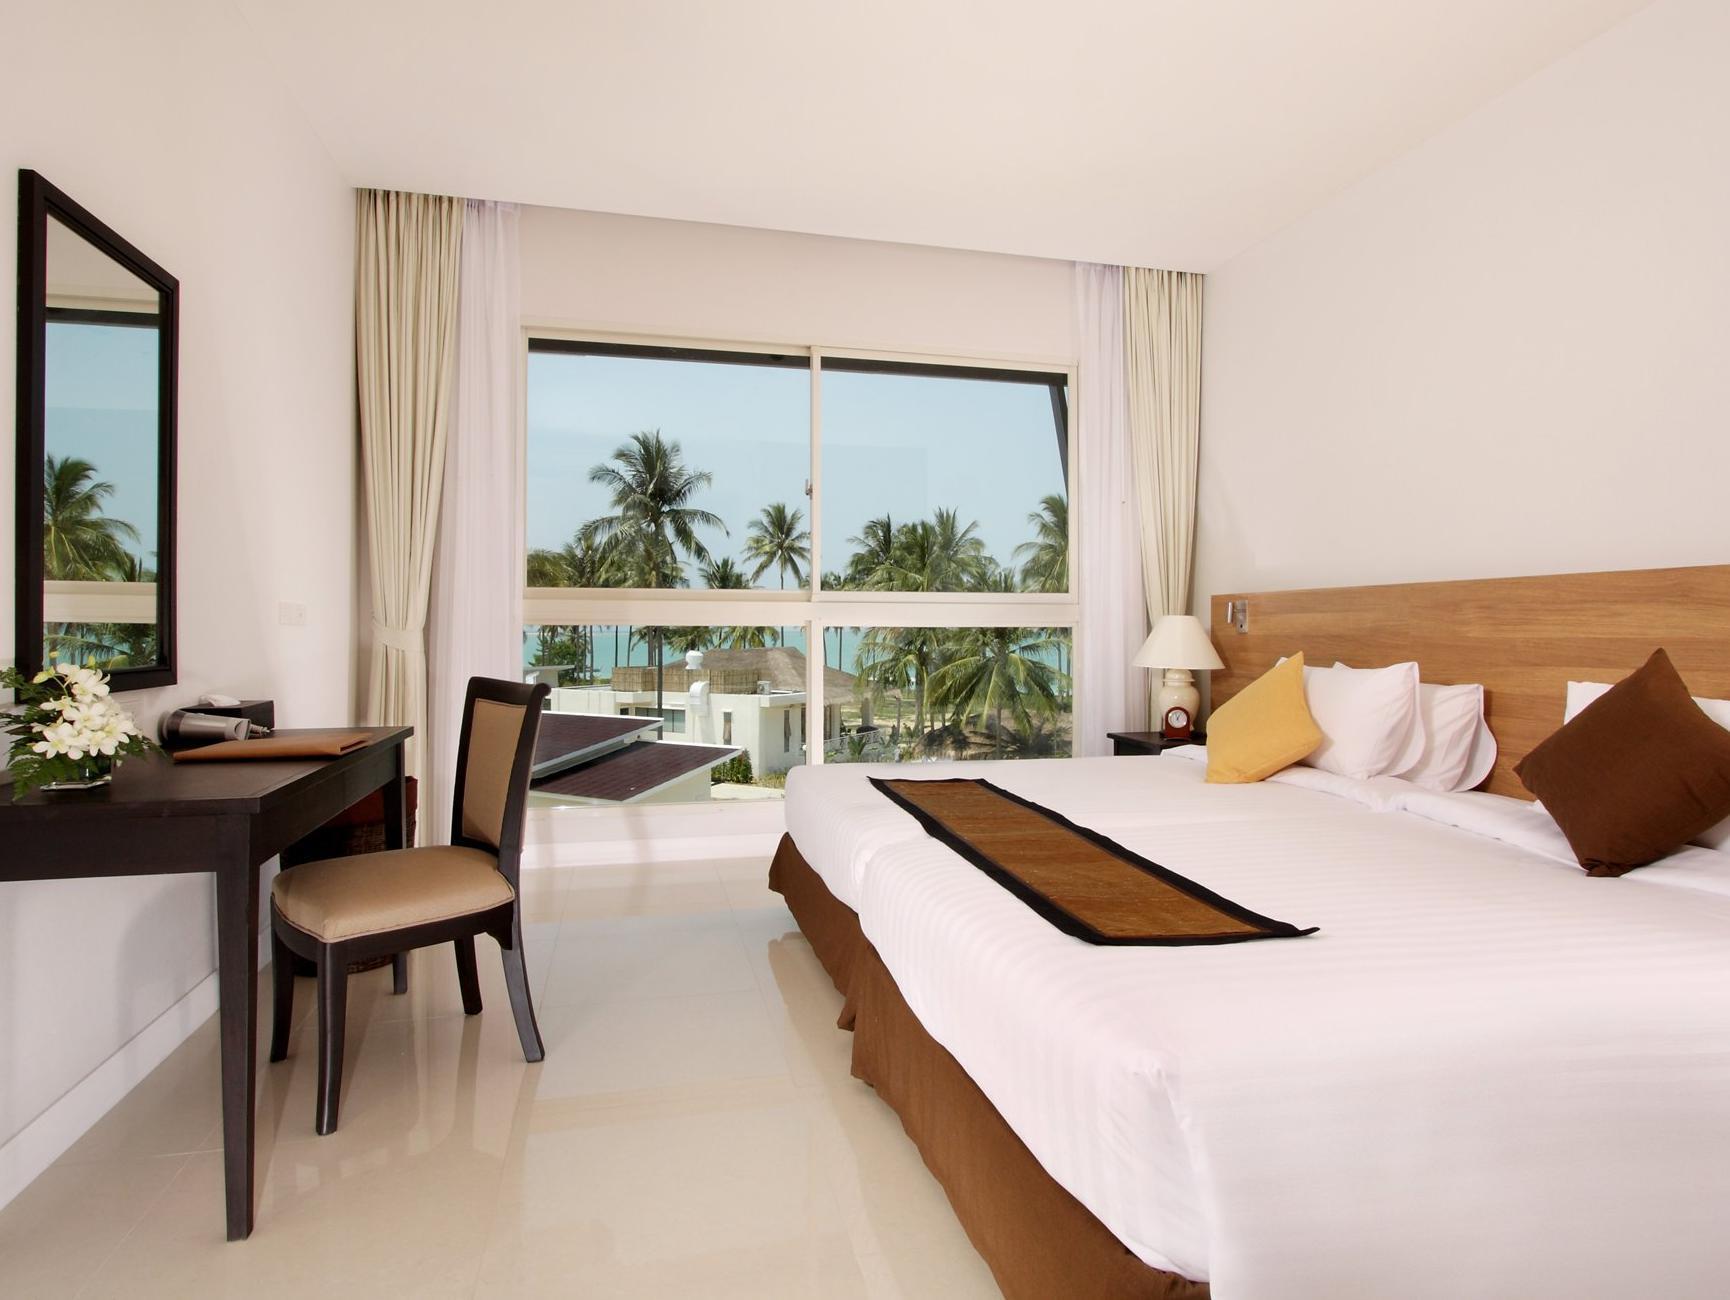 Kantary Beach Villas & Suite - Khao Lak,แคนทารี บีช วิลลา แอนด์ สวีท เขาหลัก